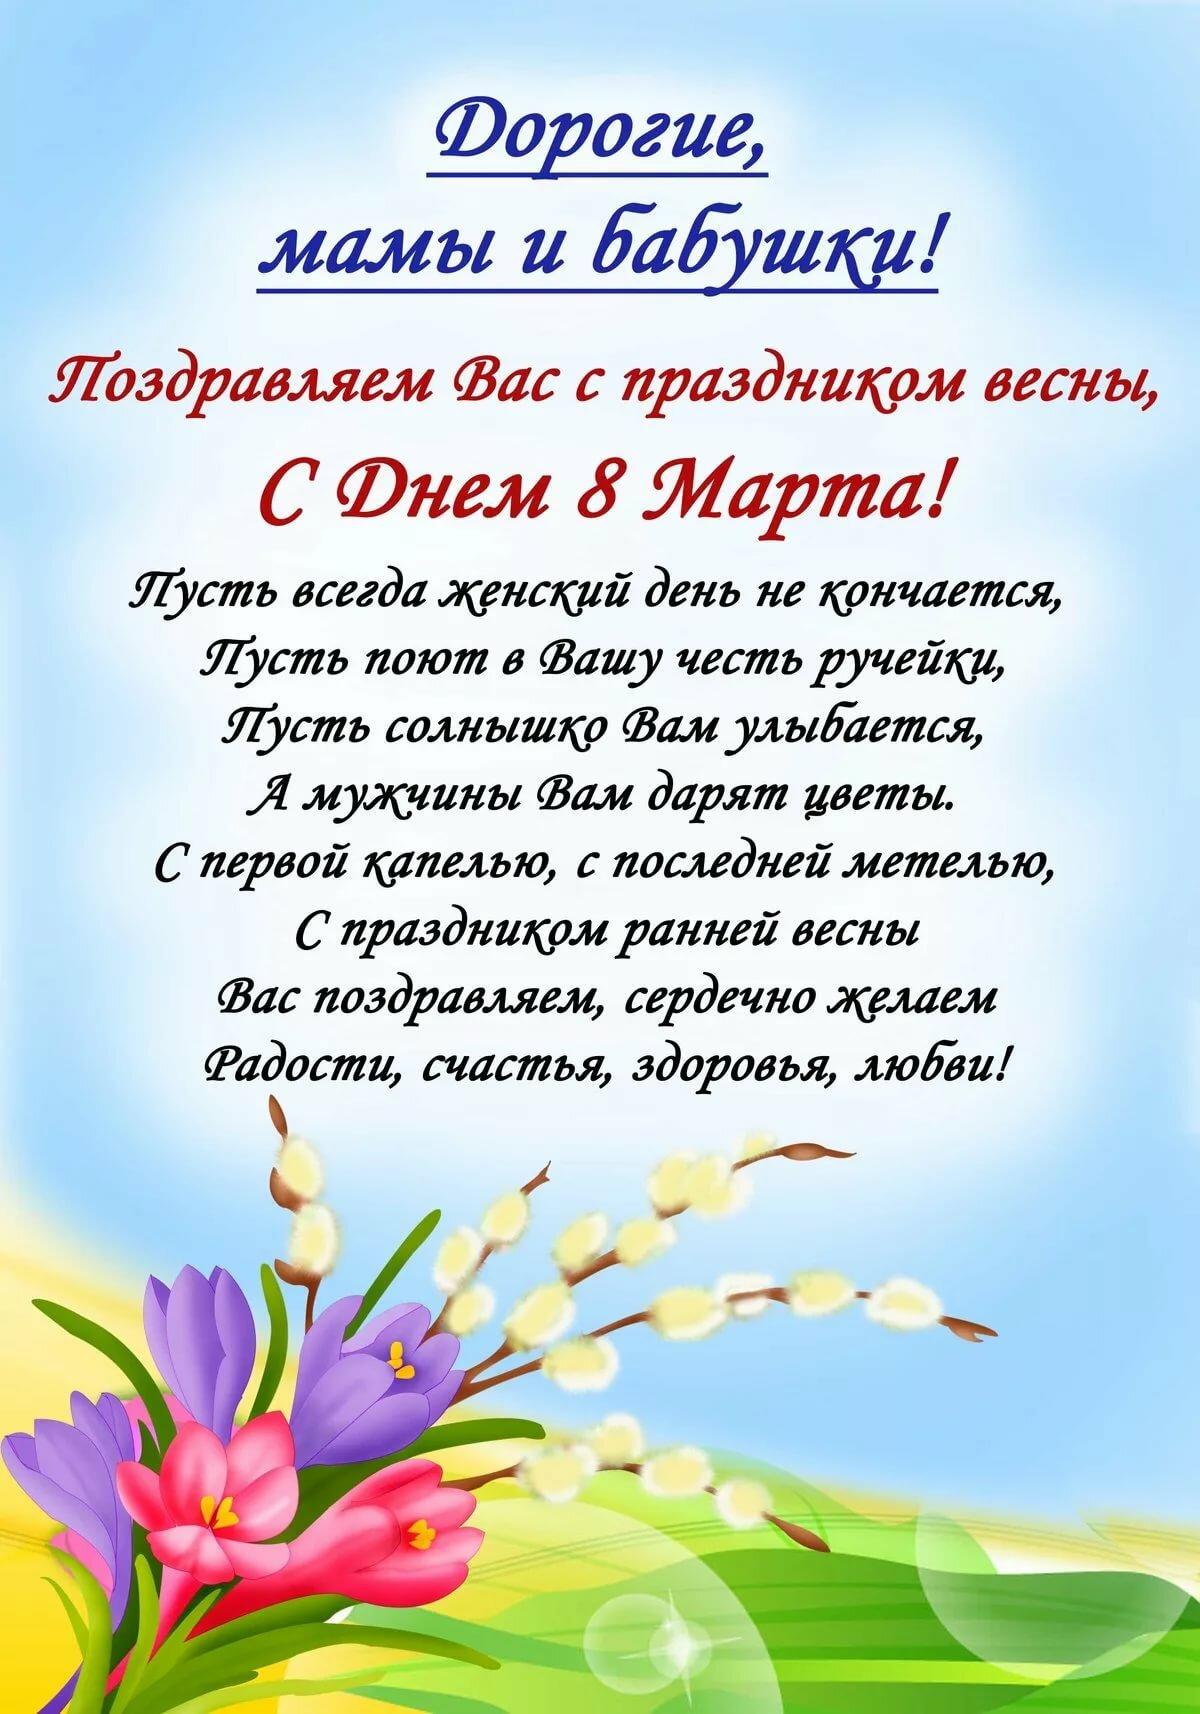 Открытки с 8 марта с поздравлениями от детей